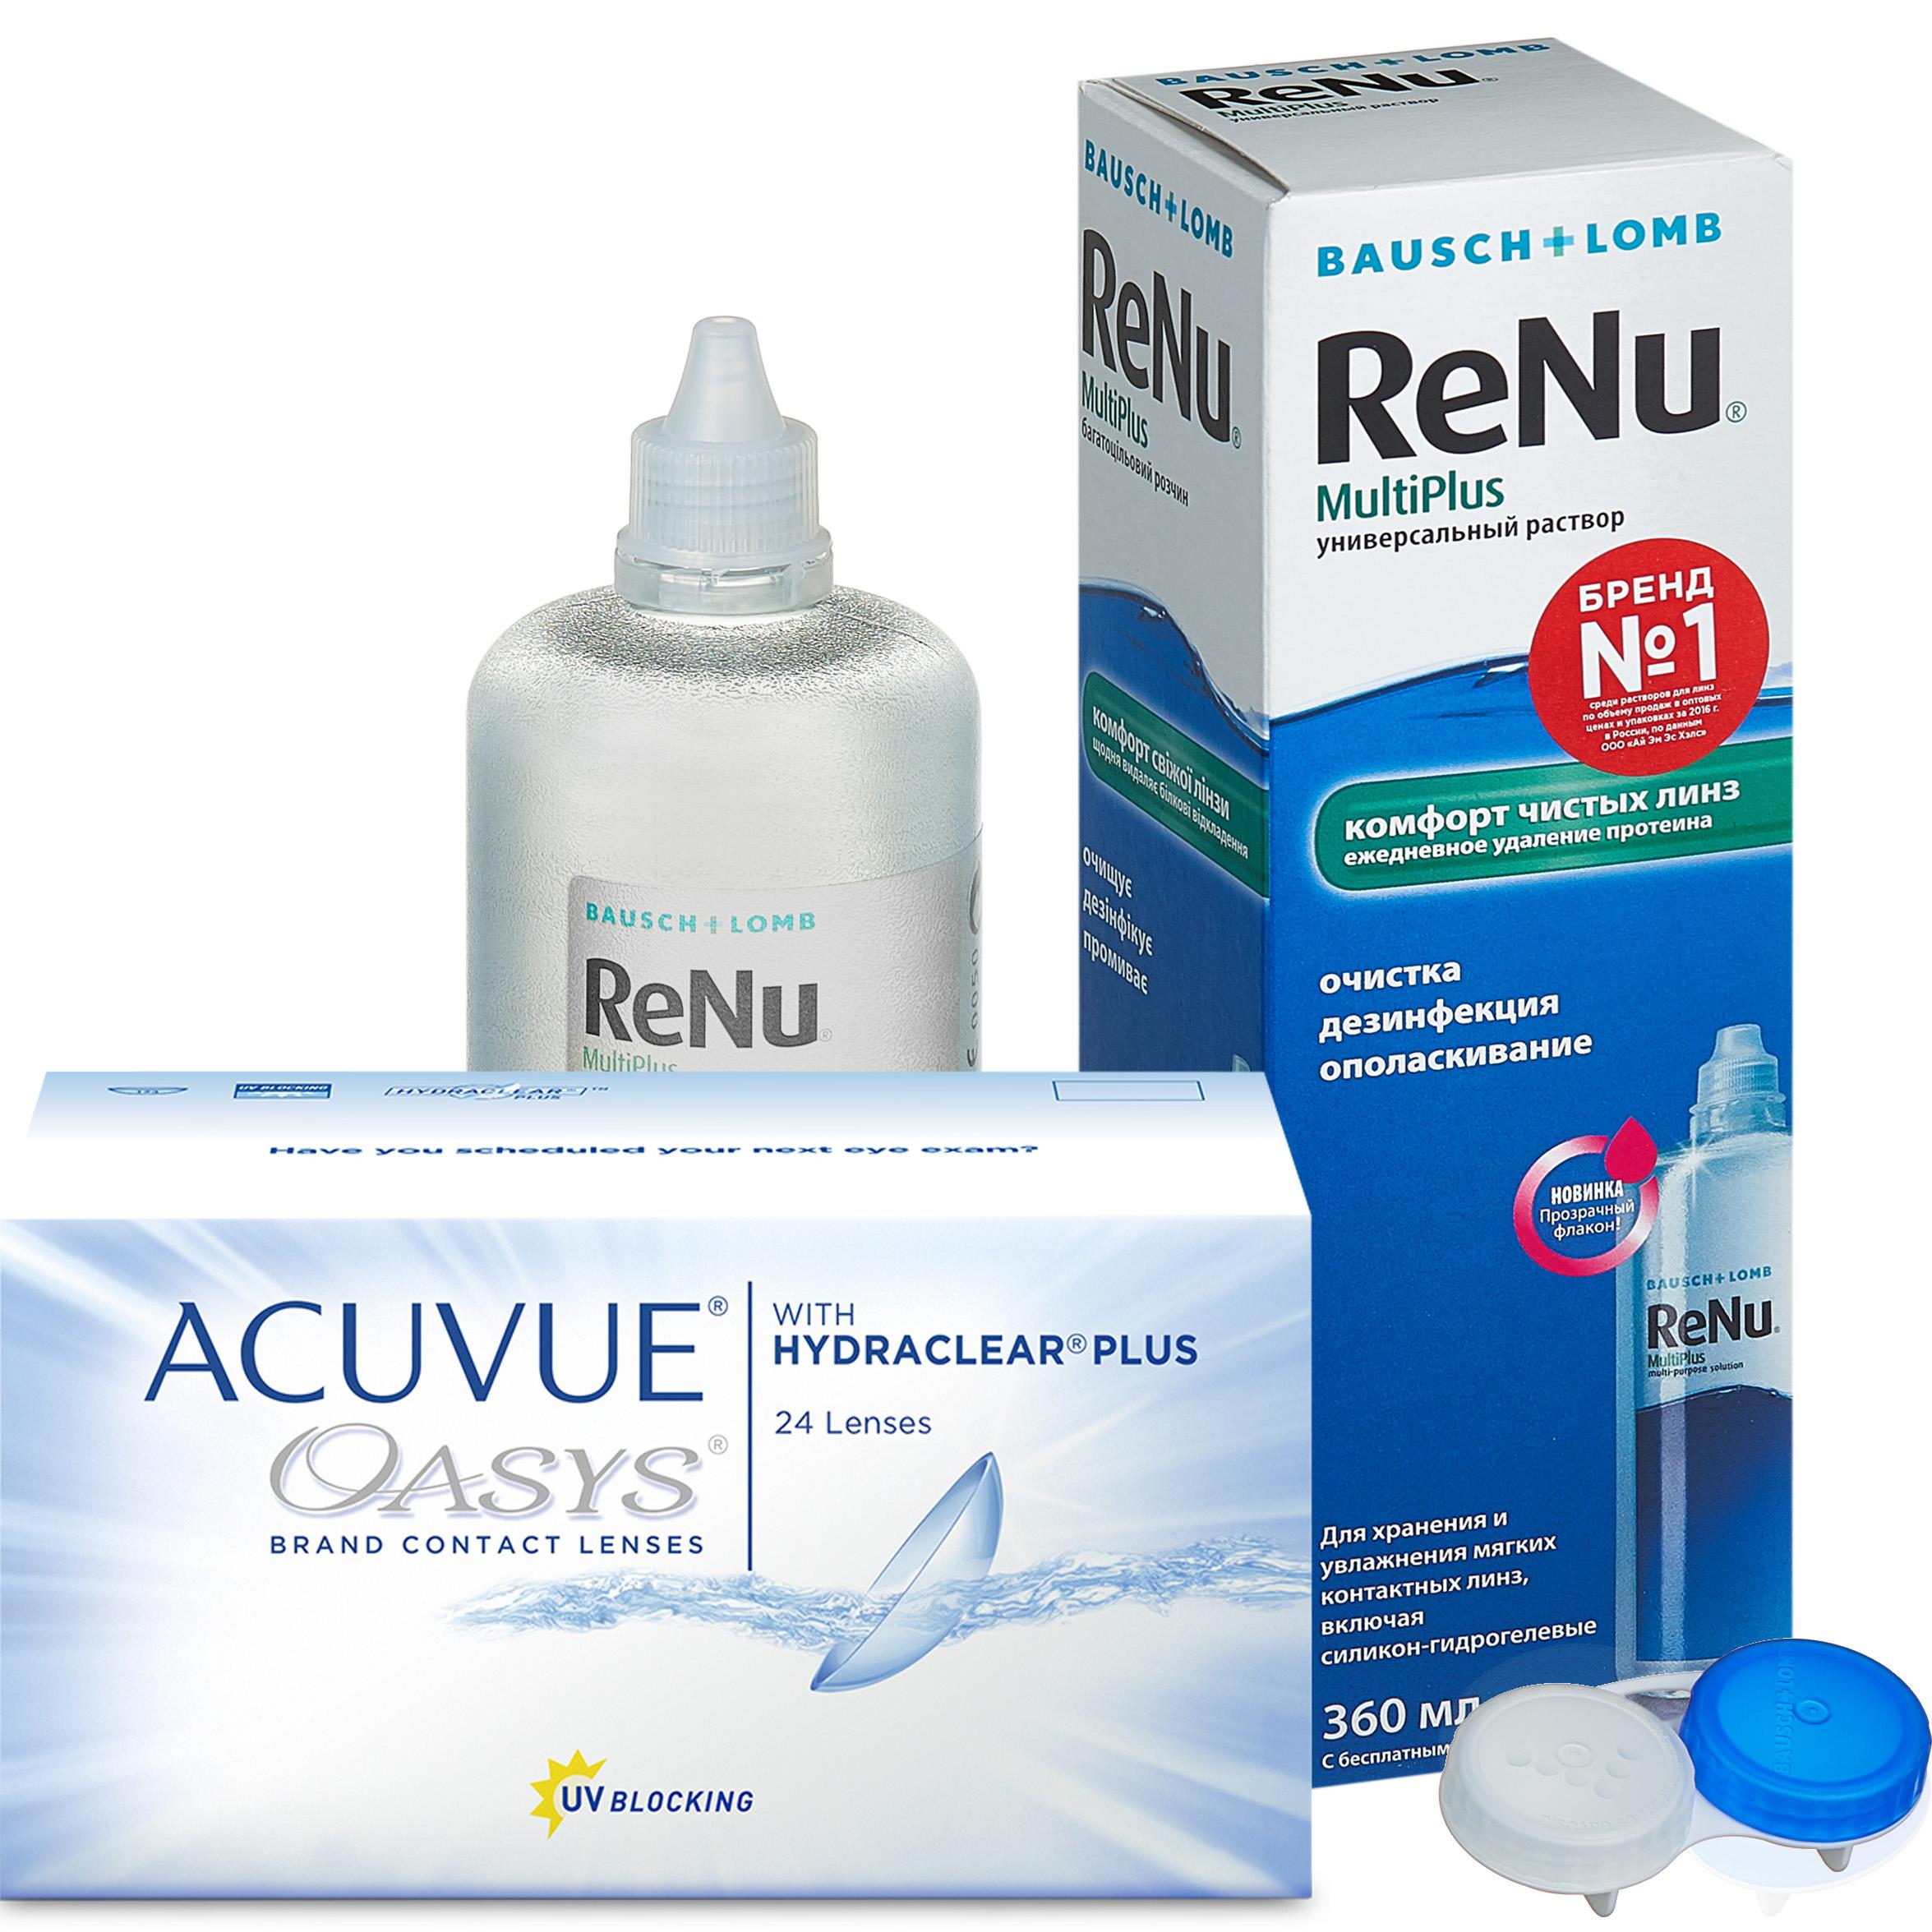 Купить Oasys with Hydraclear Plus 24 линзы + ReNu MultiPlus, Линзы Acuvue Oasys with Hydraclear Plus 24 линзы R 8.8 -1, 50 + ReNu Multi Plus 360 мл